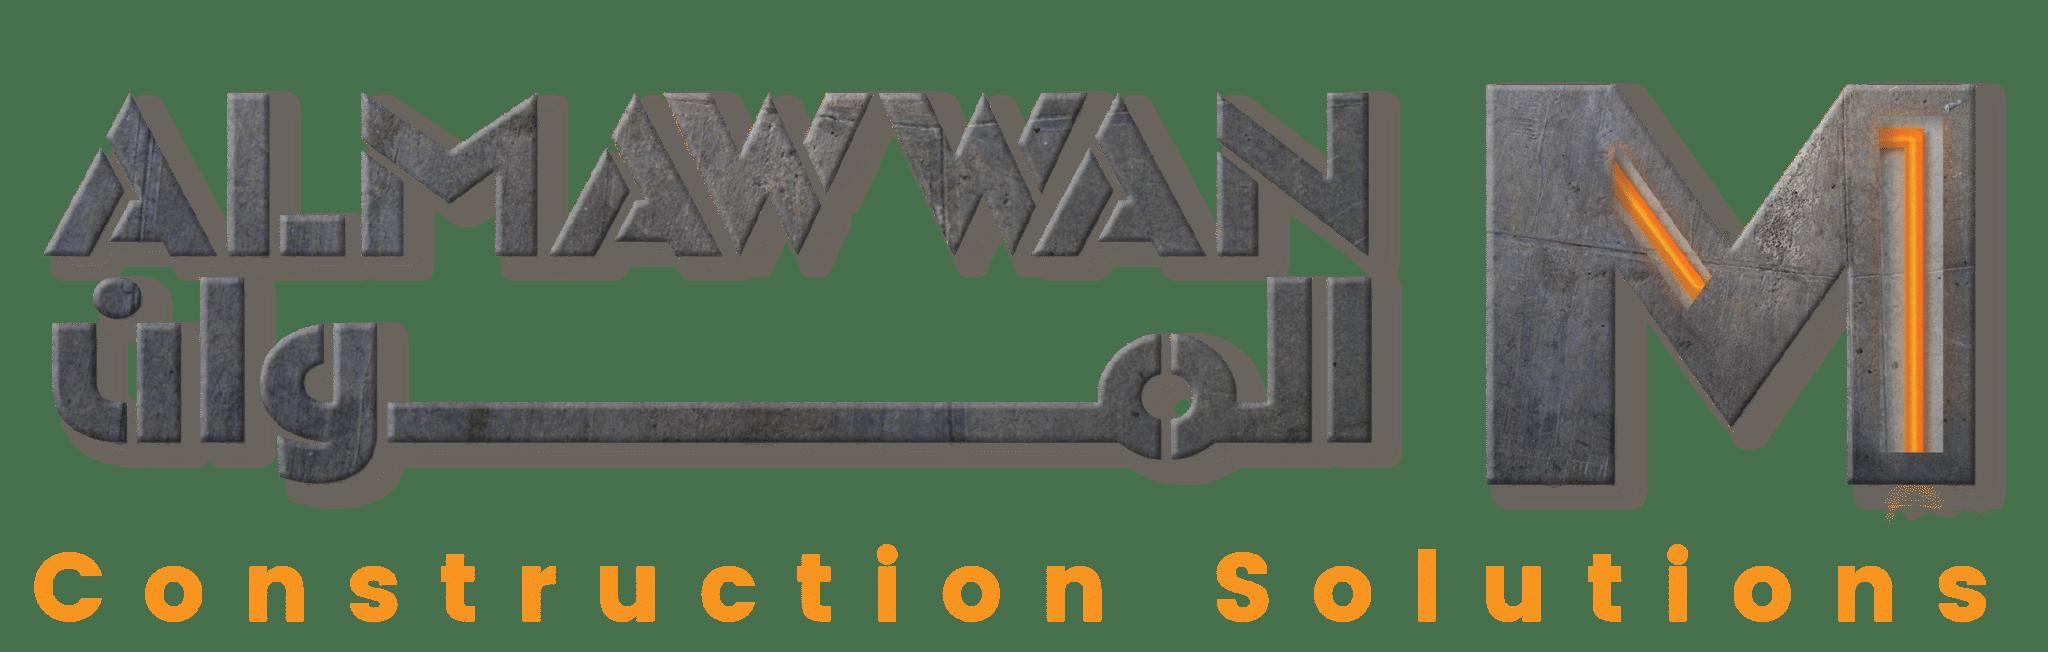 5. Al Mawwan